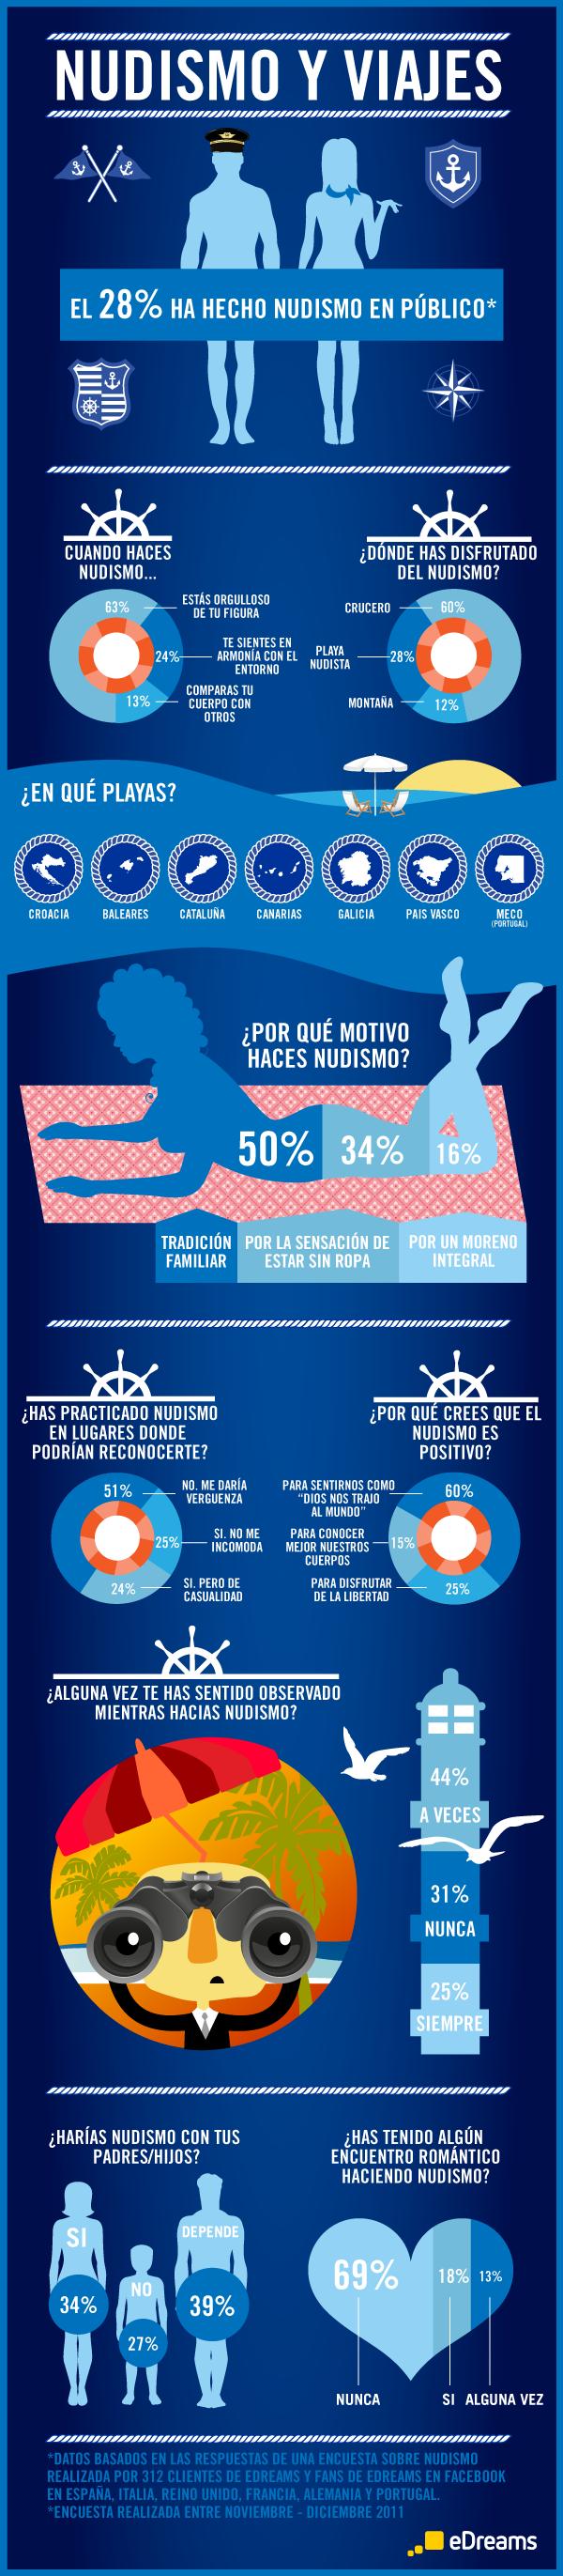 infografico nudismo eDreams